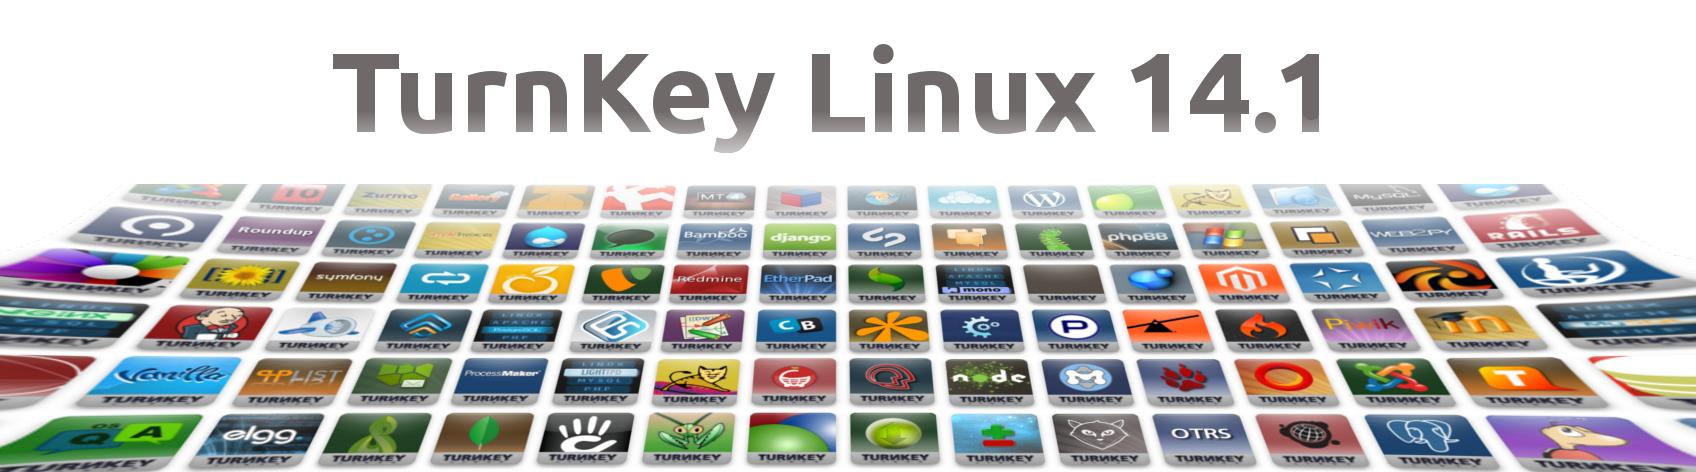 TurnKey Linux 14.1